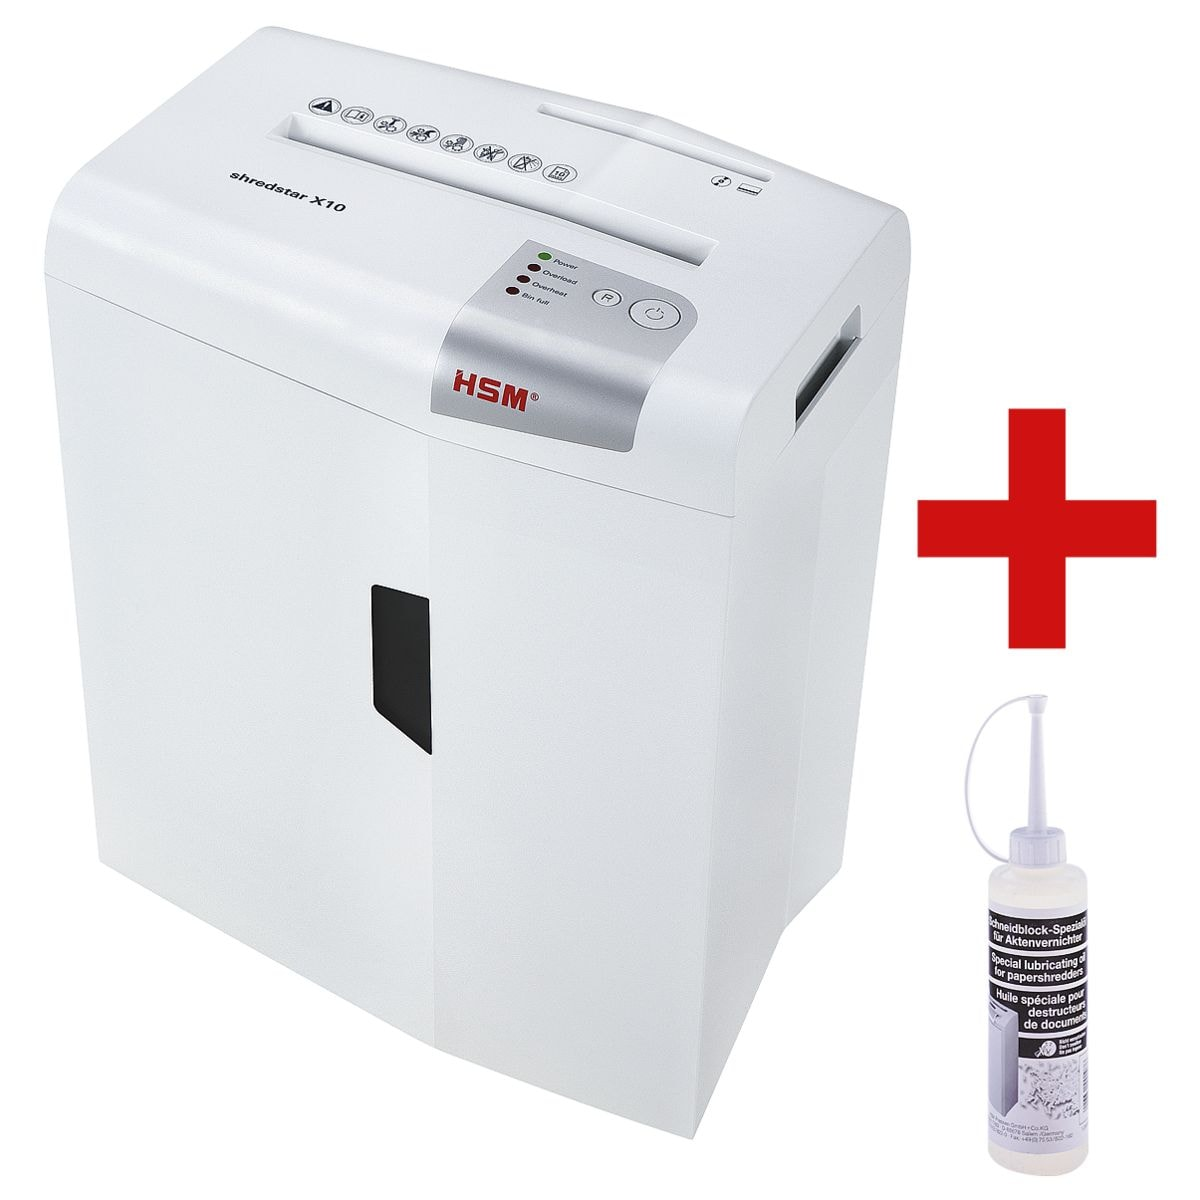 papiervernietiger HSM shredstar X10, Veiligheidsklasse 4, snippers (4,5 x 30 mm) tot 10 bladen incl. Speciale olie voor papiervernietigers